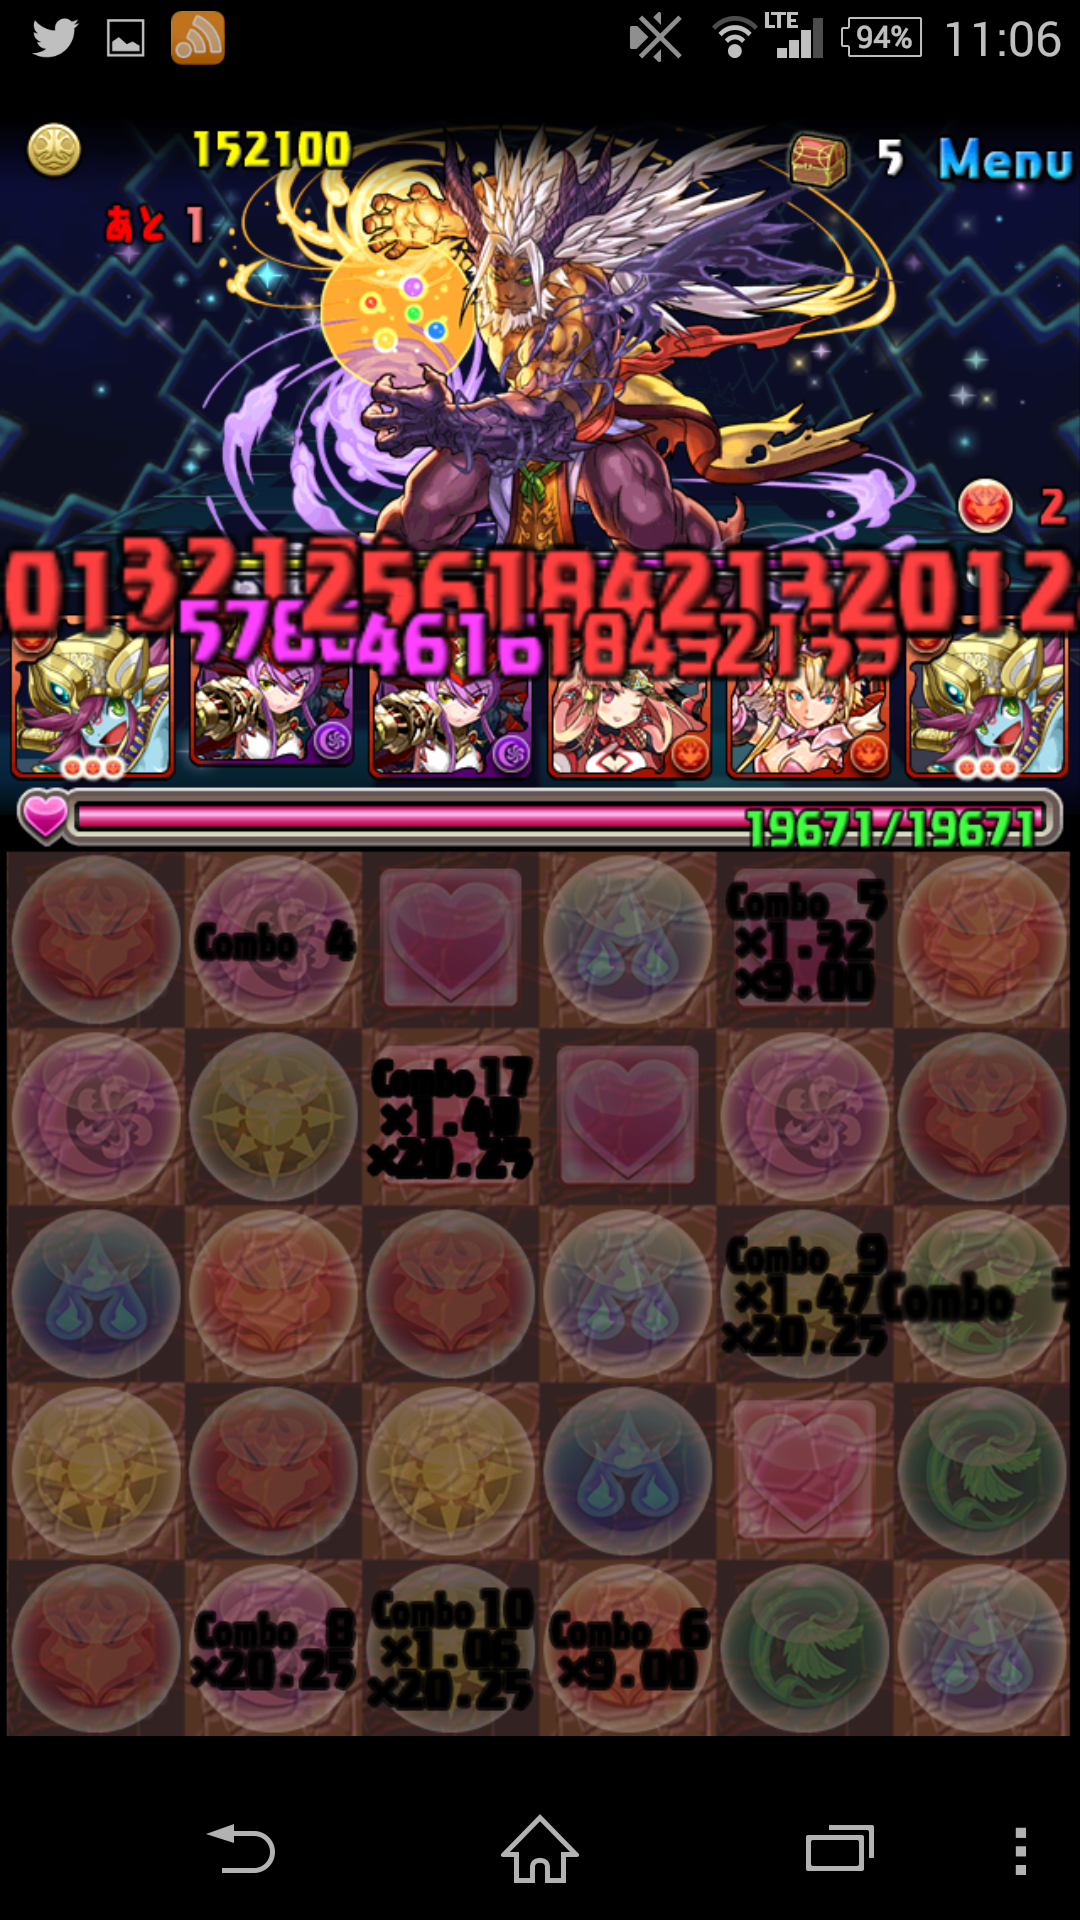 Screenshot_2015-01-17-11-06-48.png